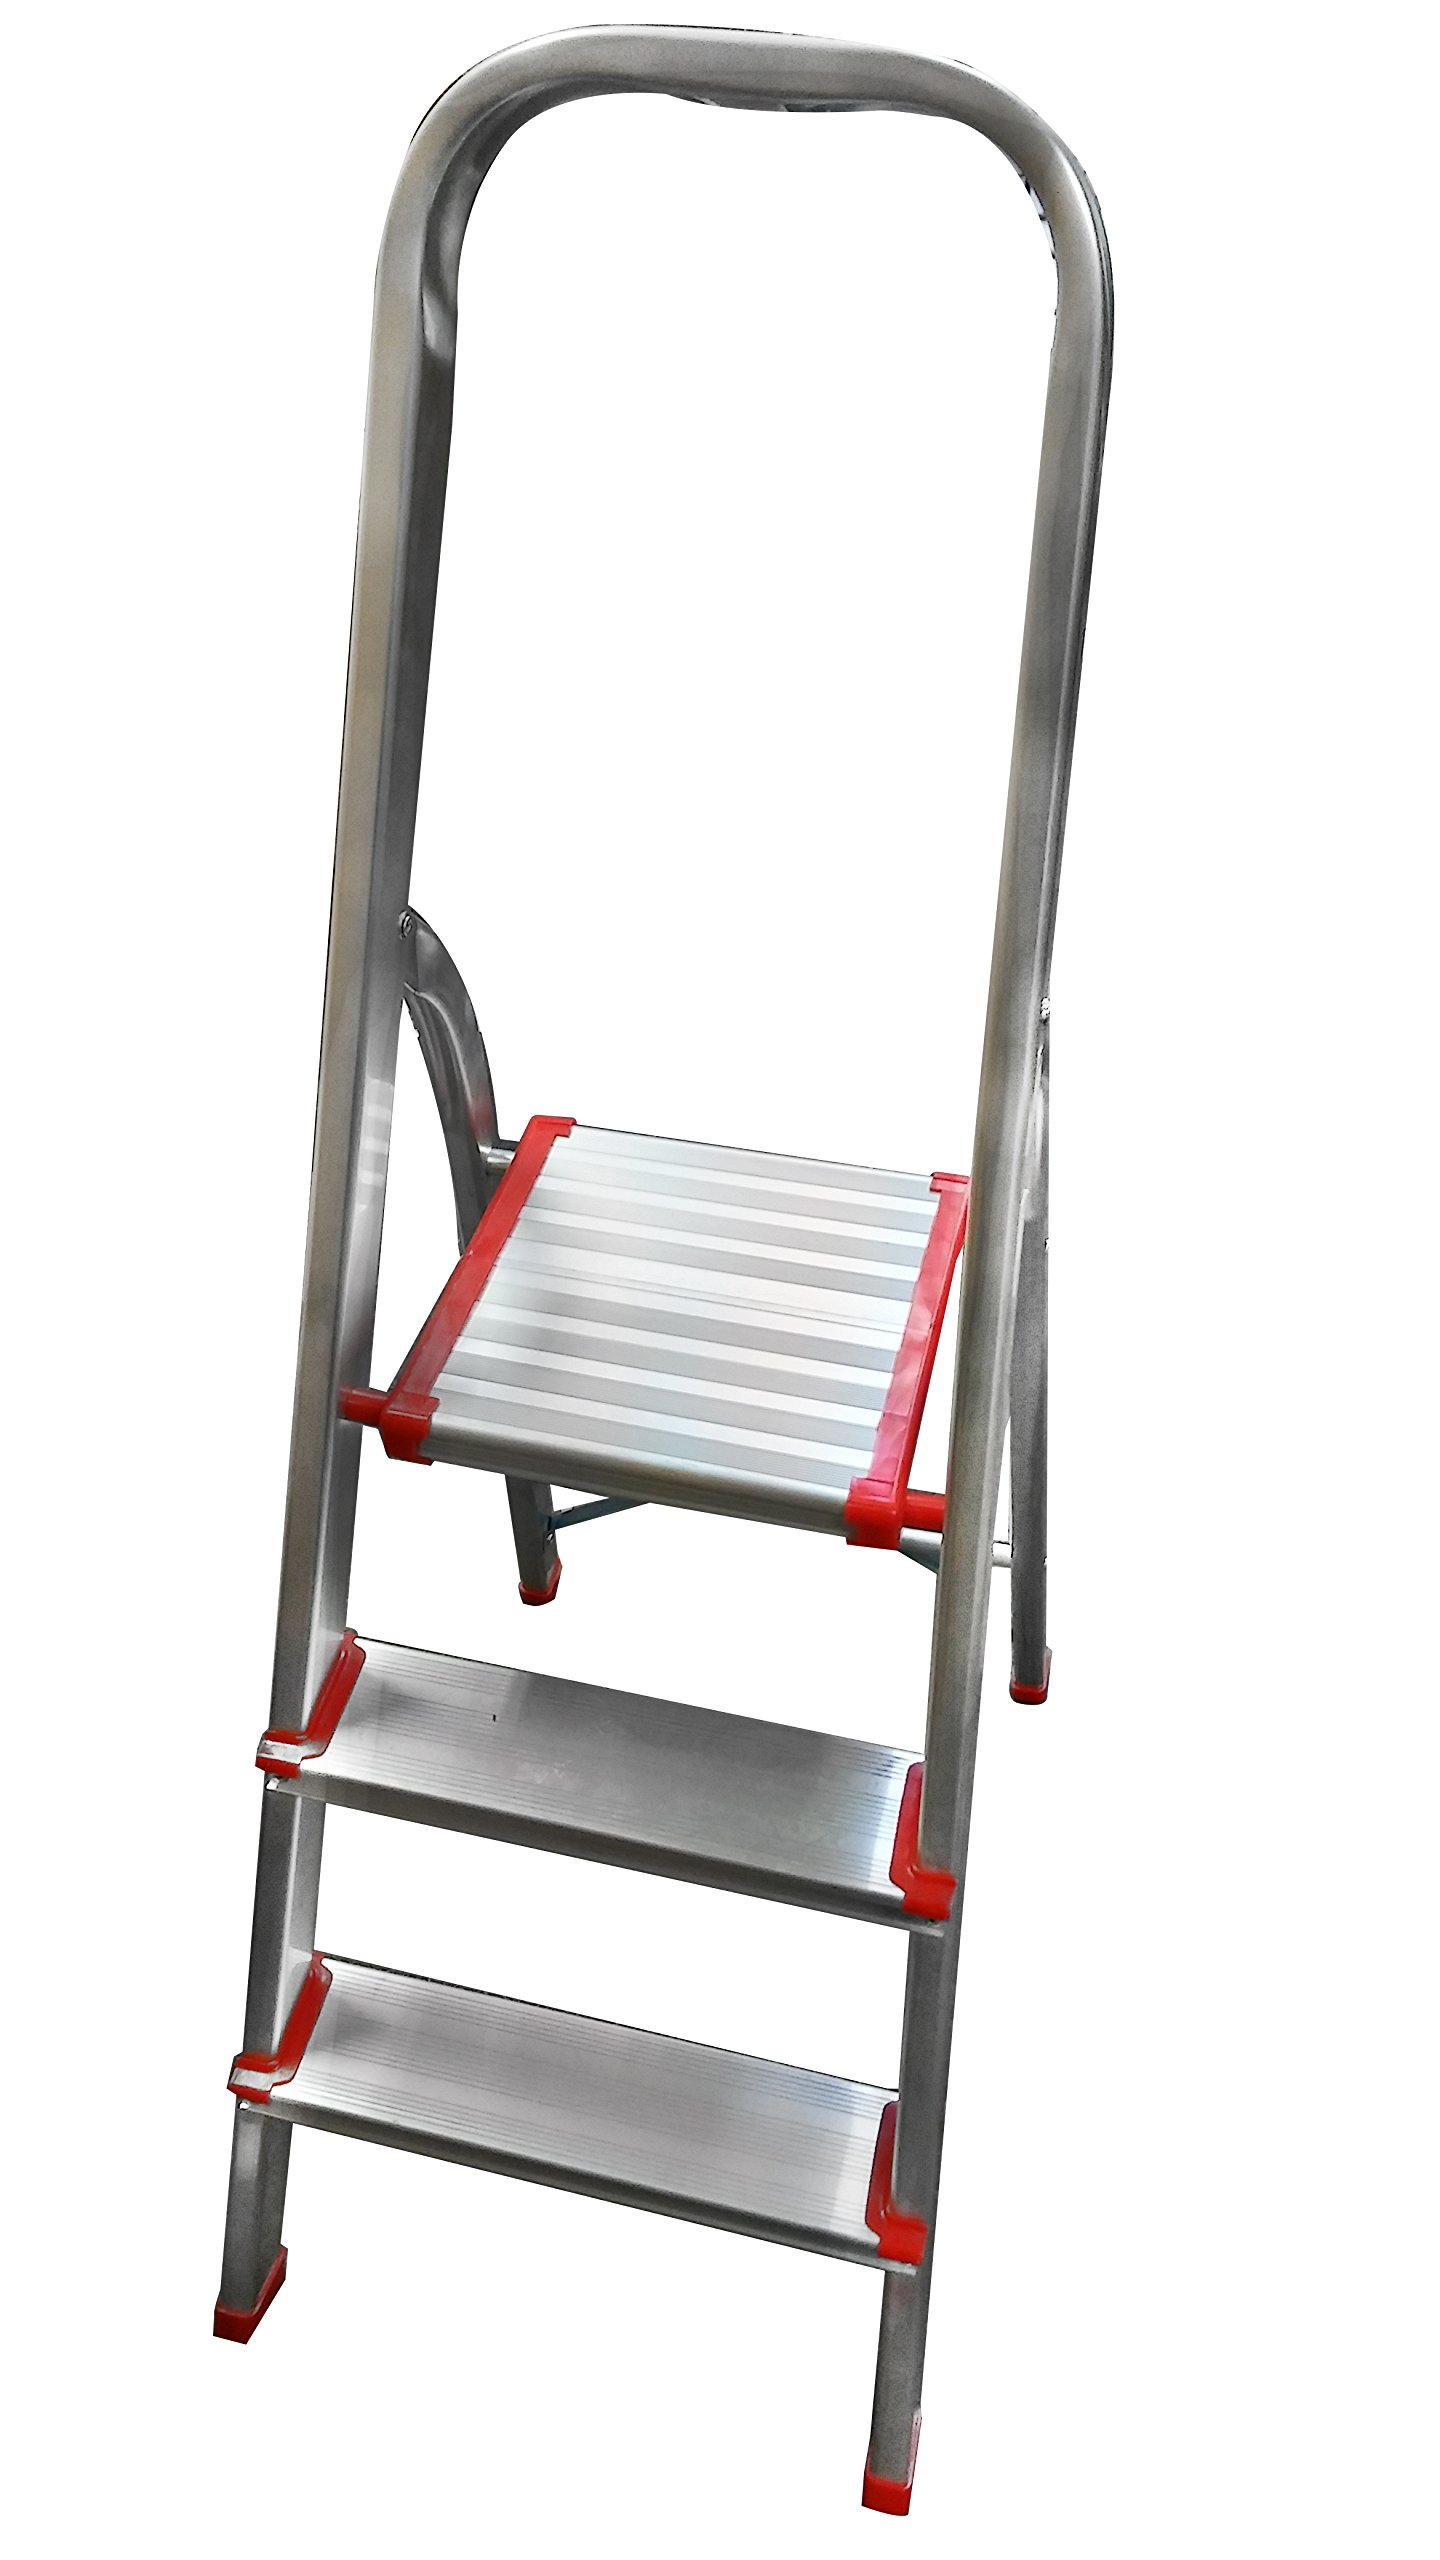 LavoHome 330lbs Upper Reach LightWeight Reinforced Aluminum Folding Step-Ladder Stool Household Kitchen Stool Ultra Light With Platform (3 Step)